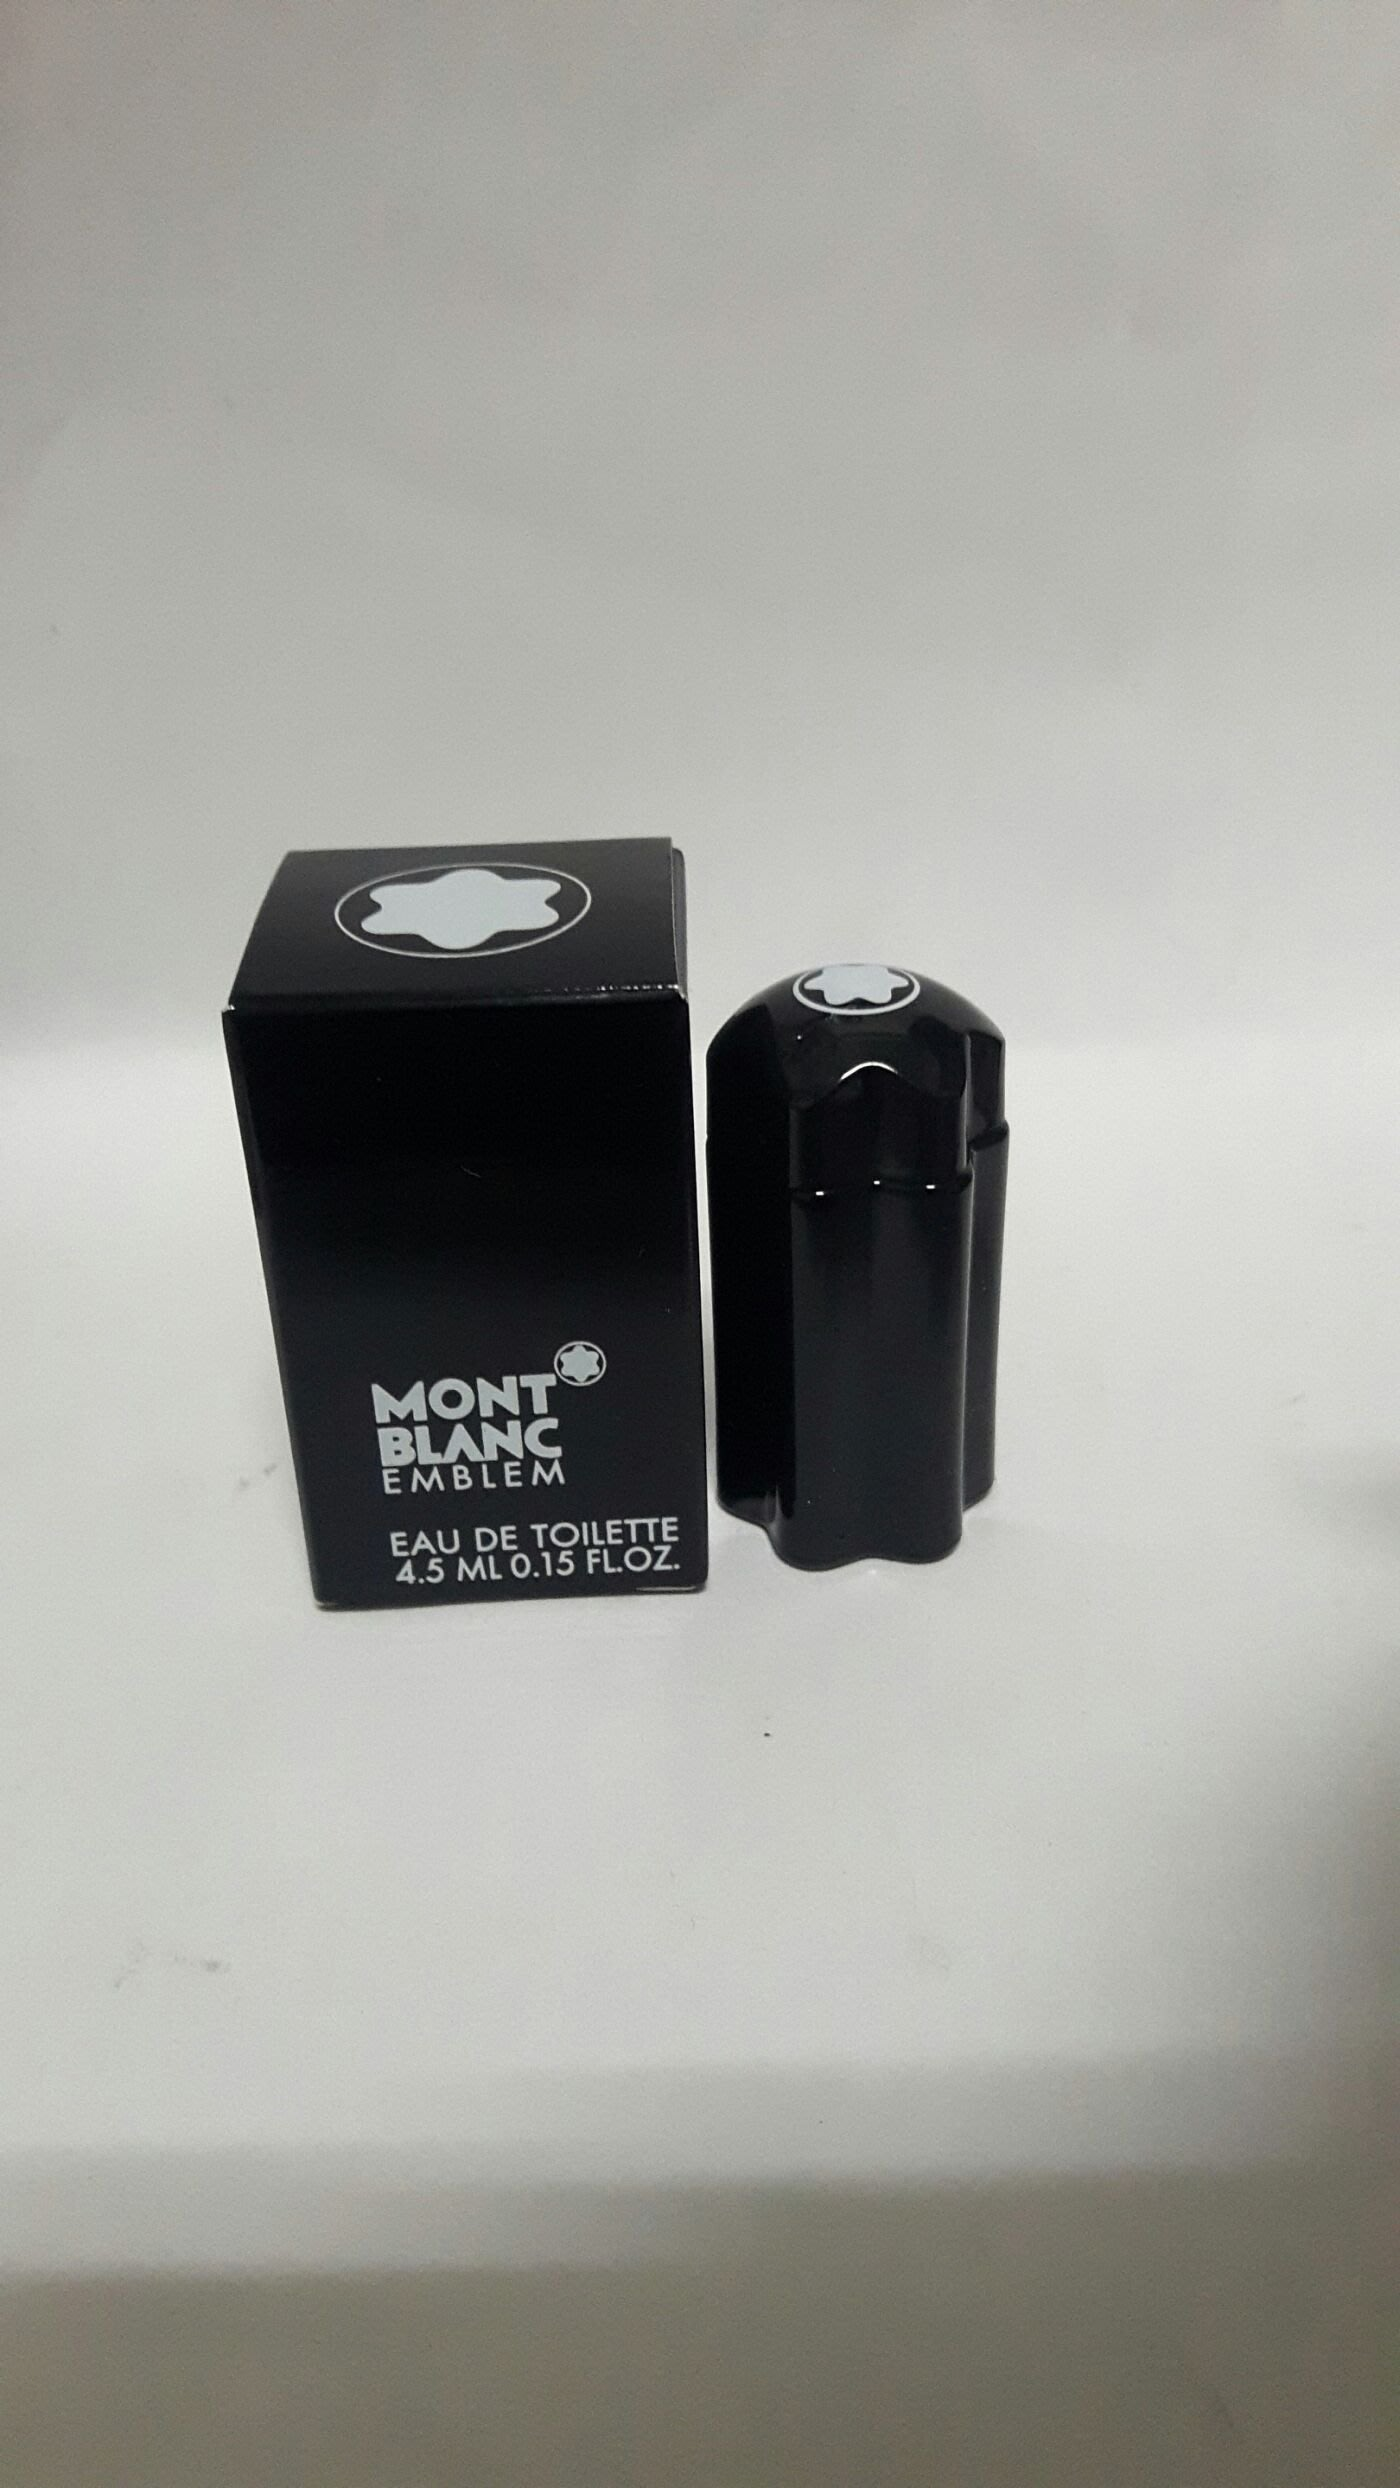 Montblanc萬寶龍 男性香水4.5 ml 小香水一瓶